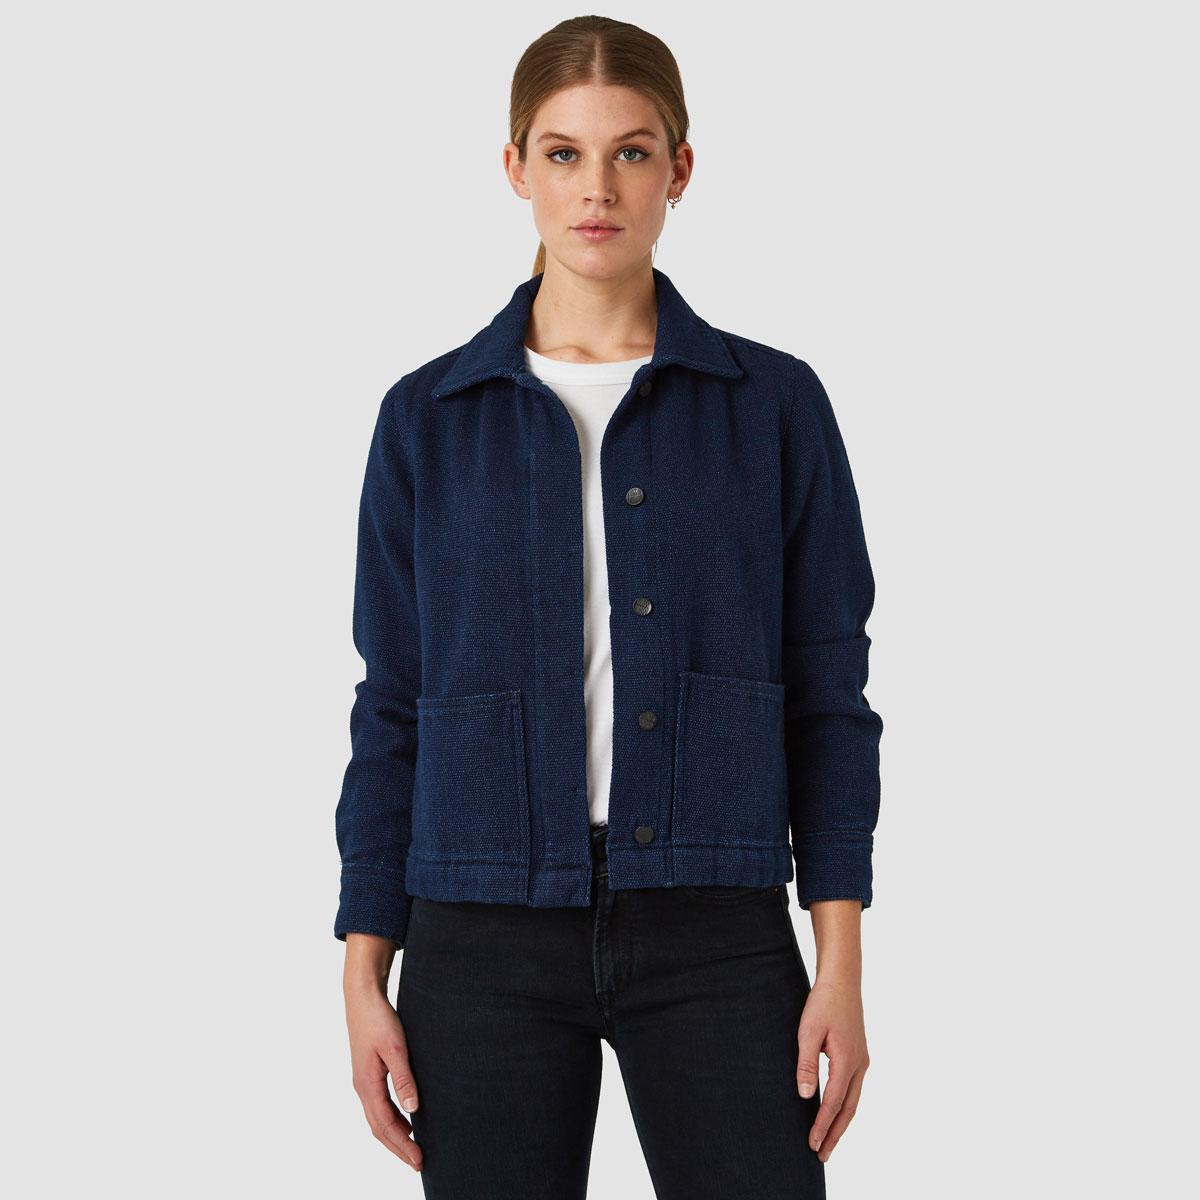 Workwear inspirerad damjacka i 100% ekologisk bomull